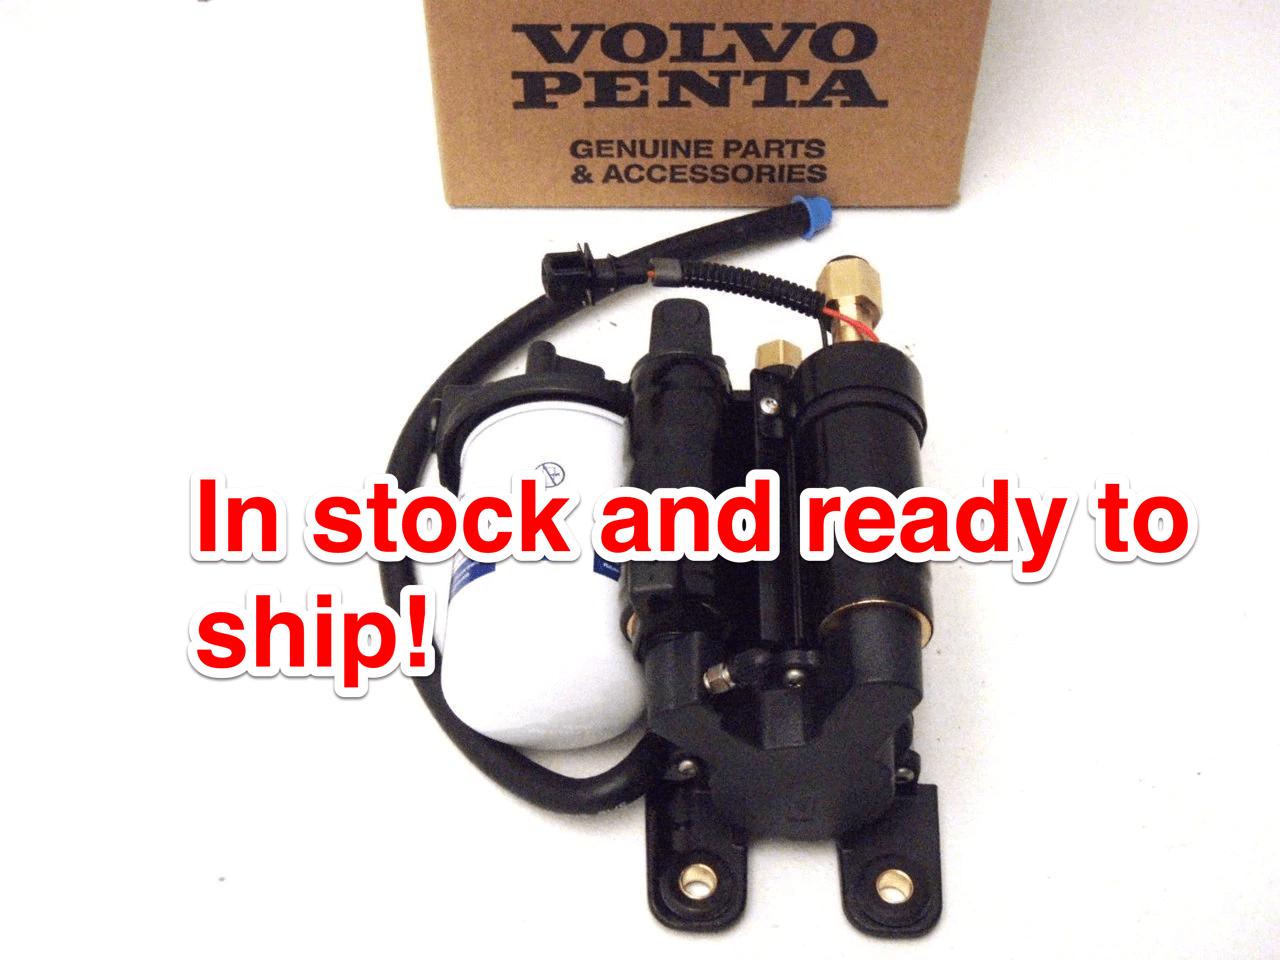 medium resolution of  849 99 genuine volvo fuel pump 21608511 in stock ready to ship